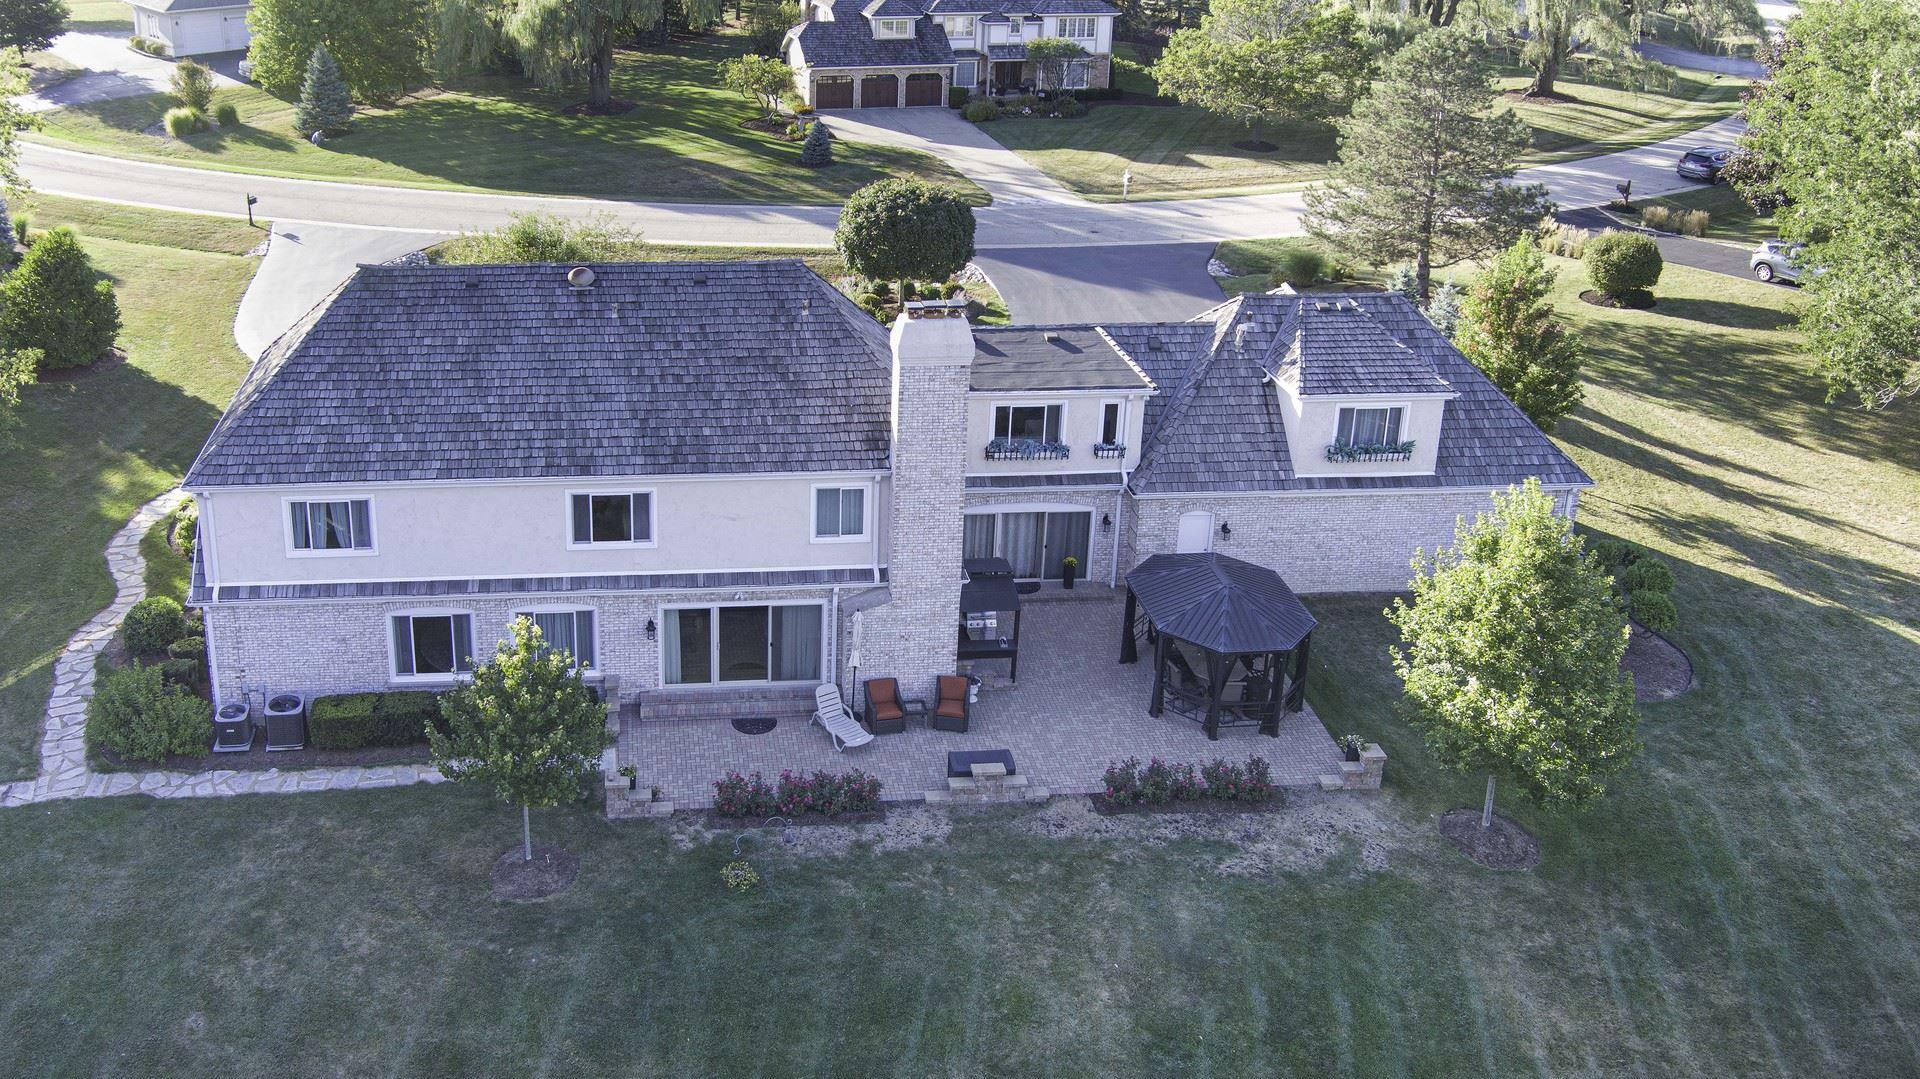 6 Oneida Lane, Hawthorn Woods, IL 60047 - #: 10650610